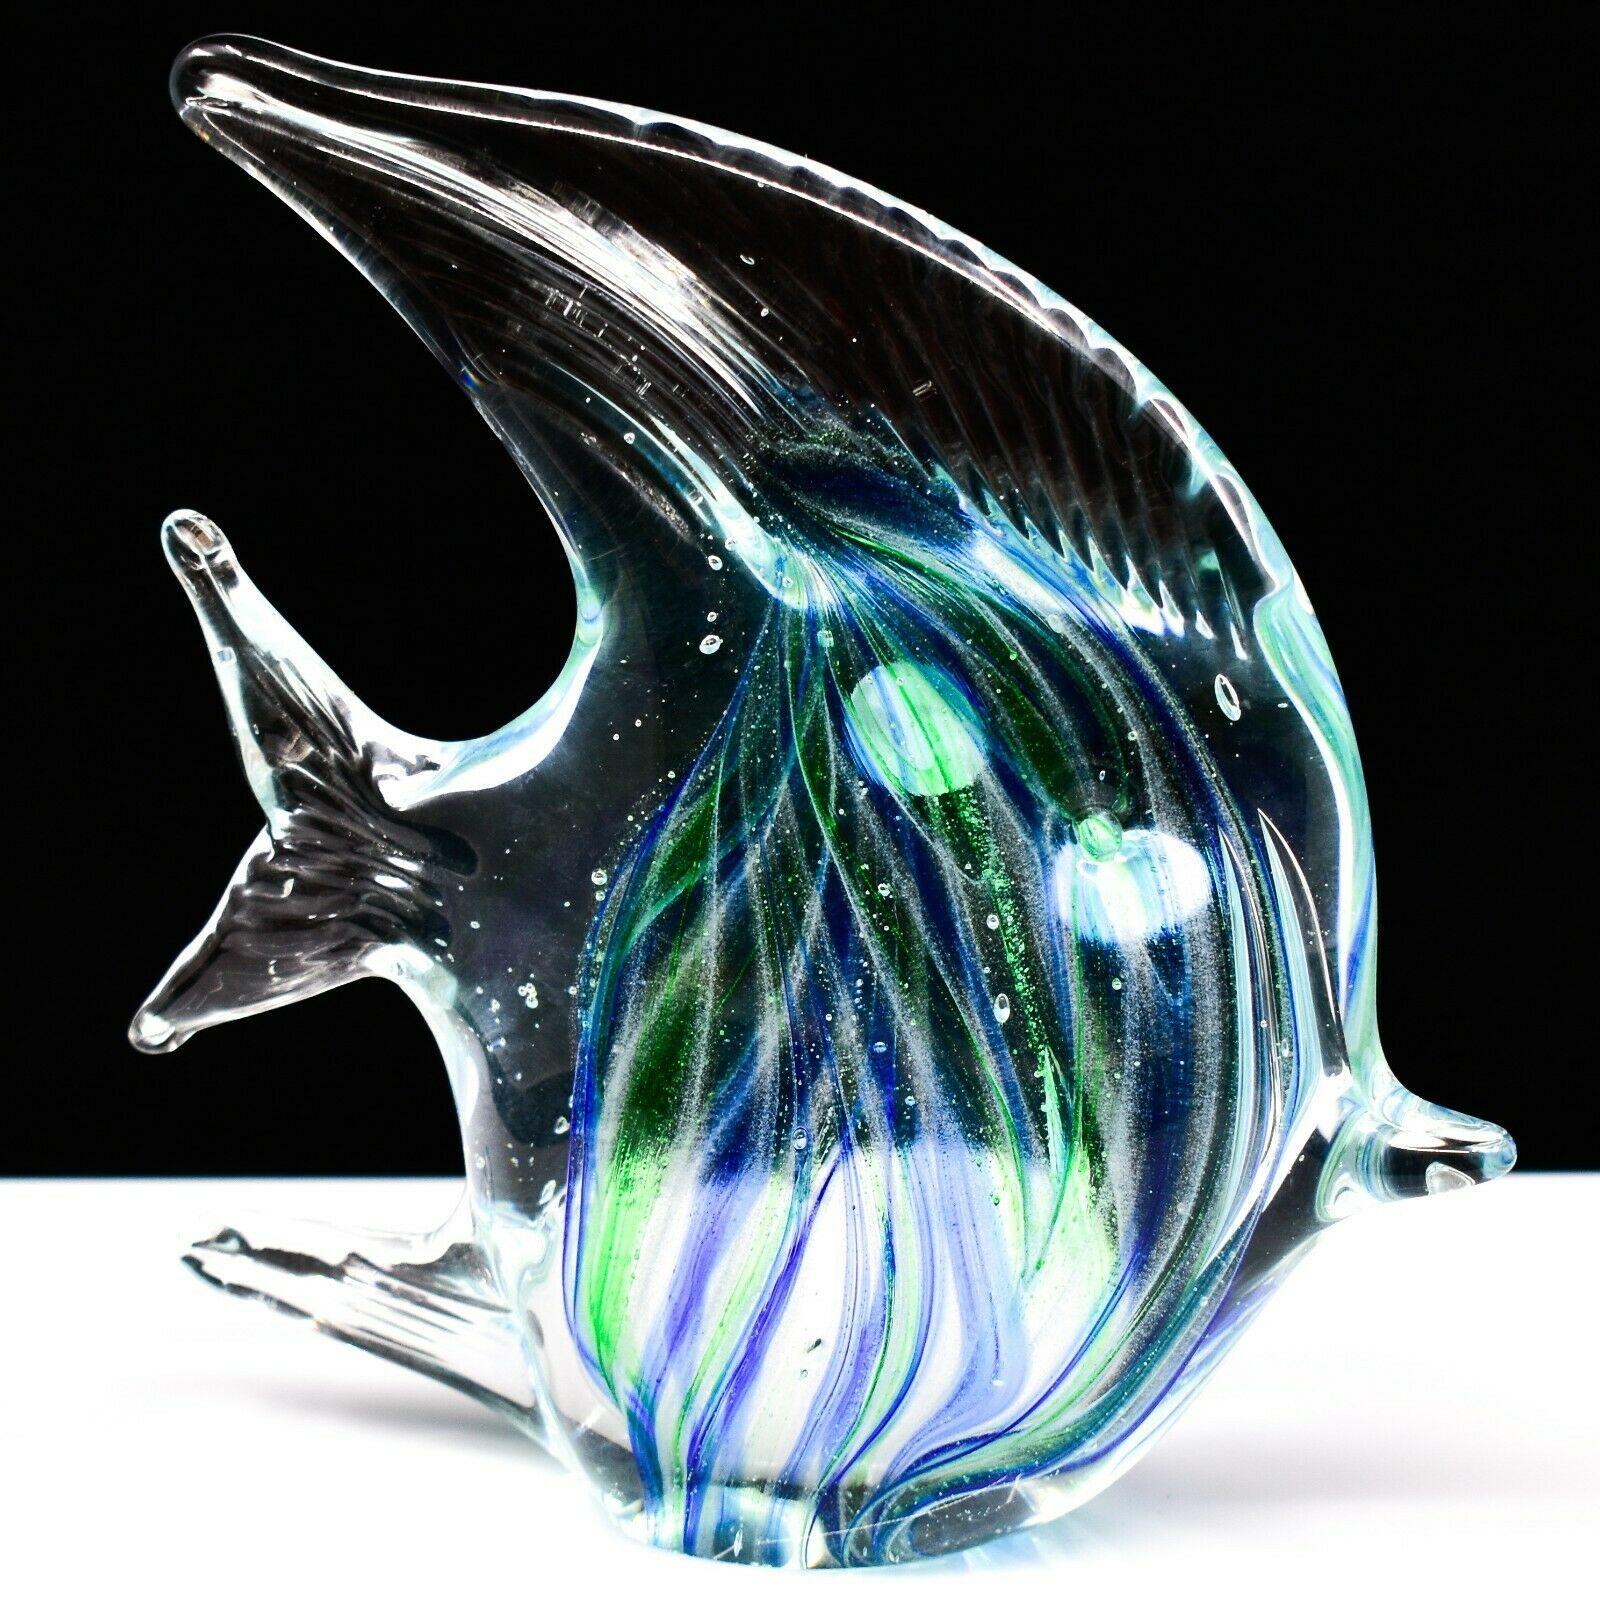 Dynasty Gallery Handmade Blue & Green Fish Glow in the Dark Art Glass Figurine